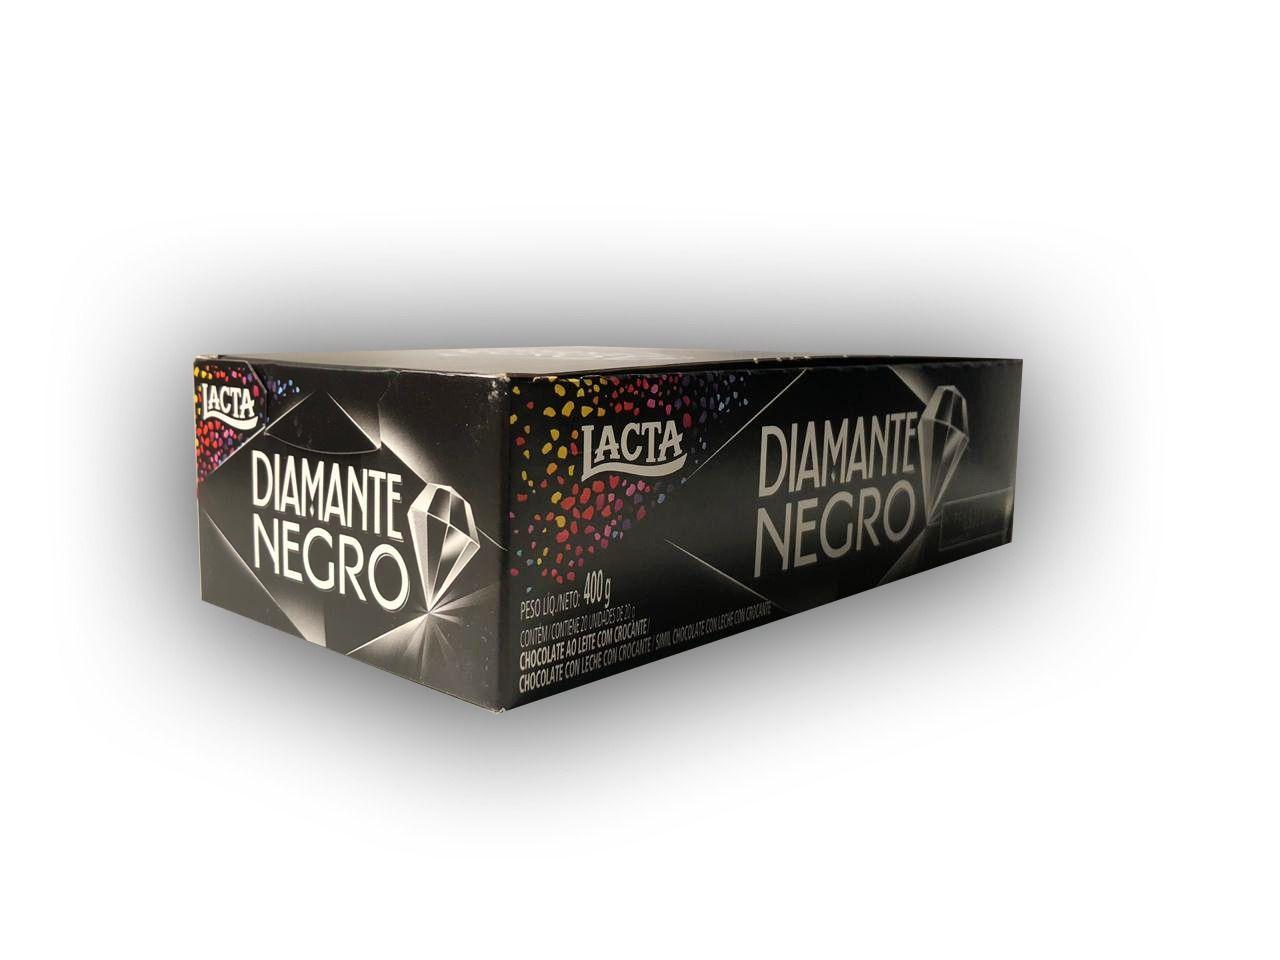 Chocolate Diamante Negro Lacta Caixa 20x20g